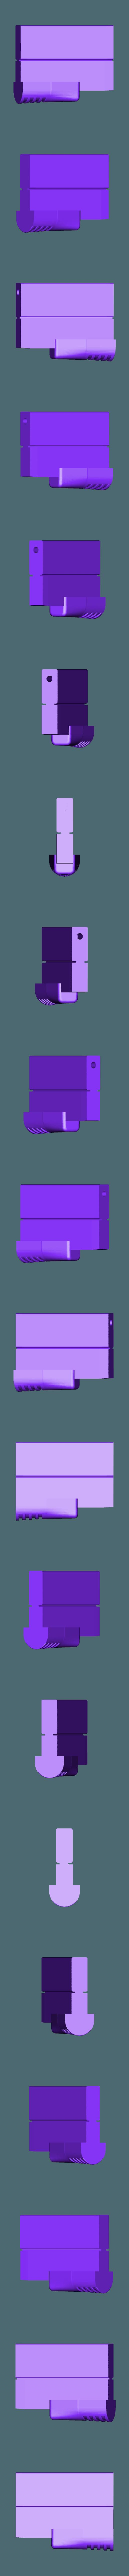 rifle_part_5.stl Download free STL file Photon Rifle (The Flash) • 3D print template, poblocki1982